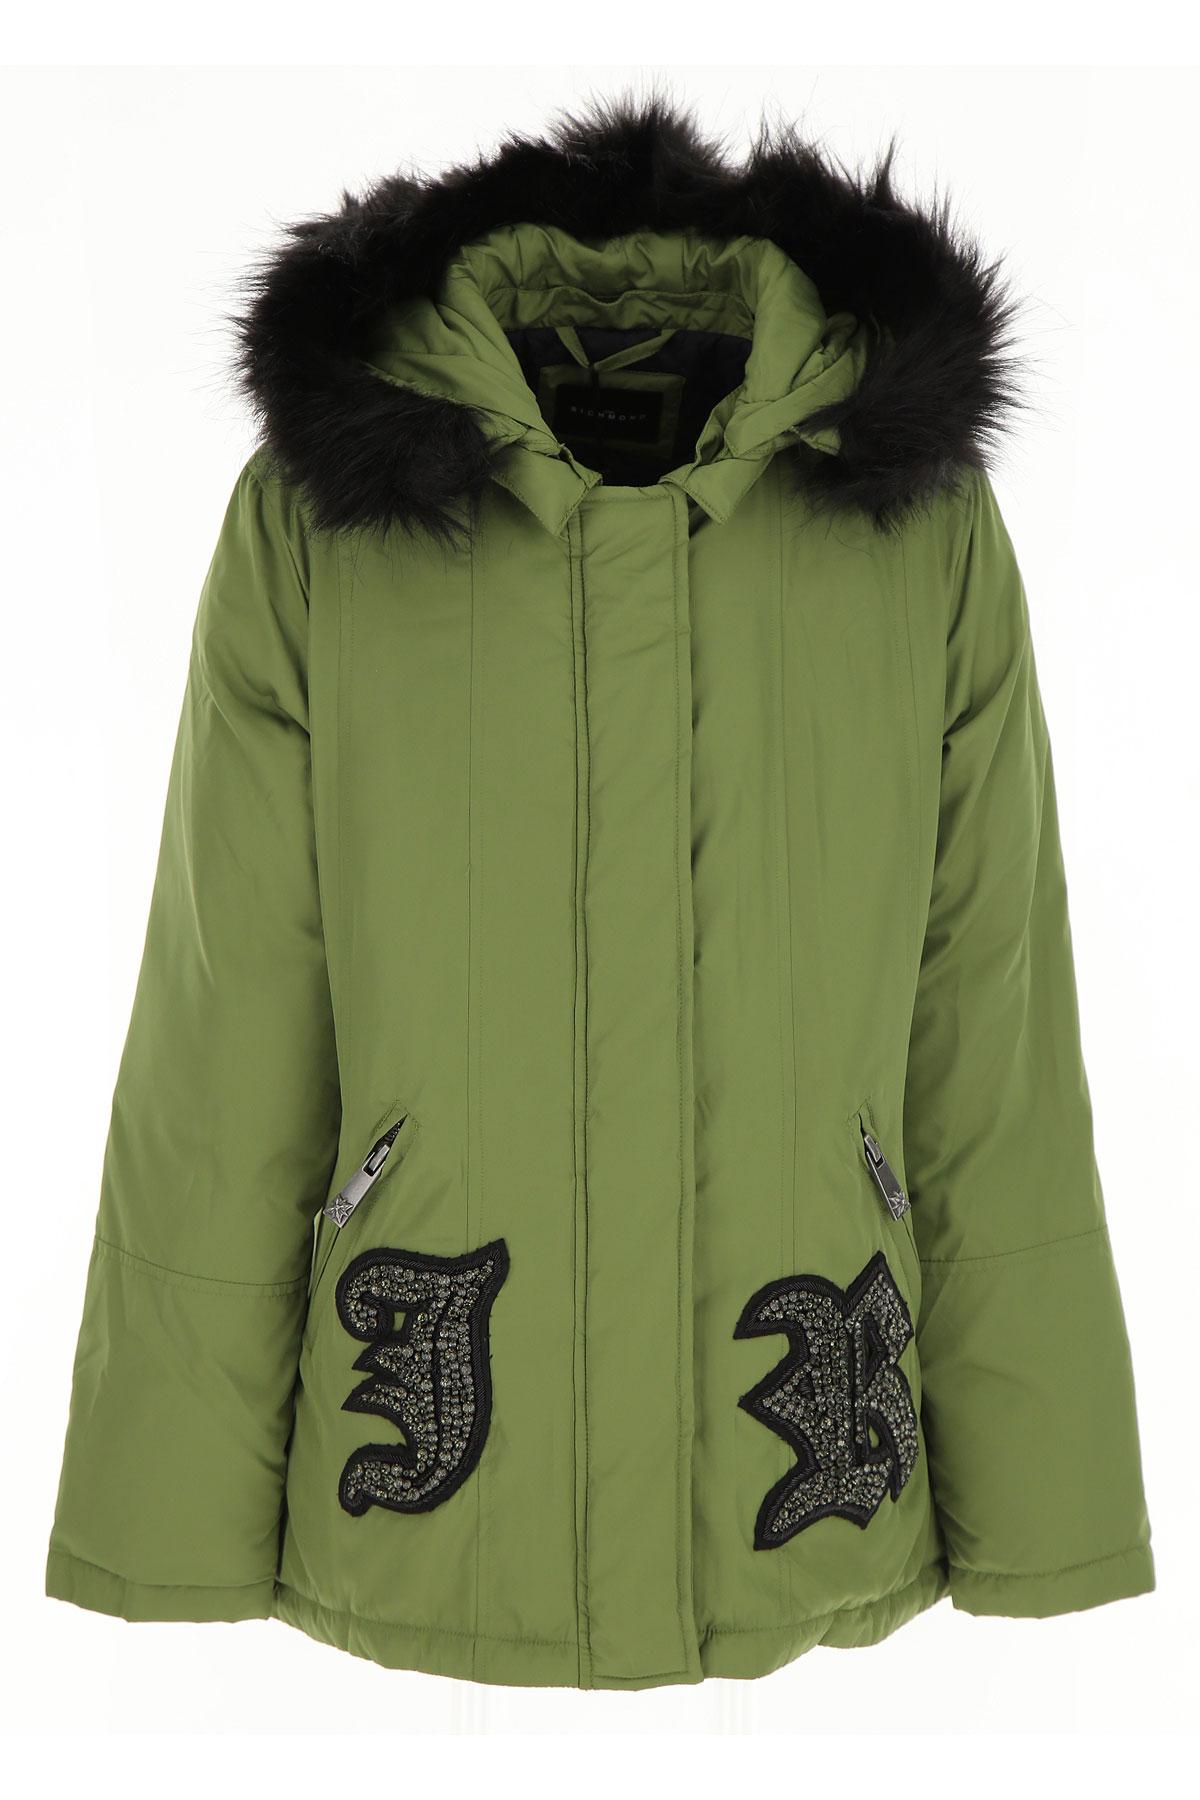 Image of John Richmond Girls Down Jacket for Kids, Puffer Ski Jacket, Green, polyester, 2017, 16Y 8Y